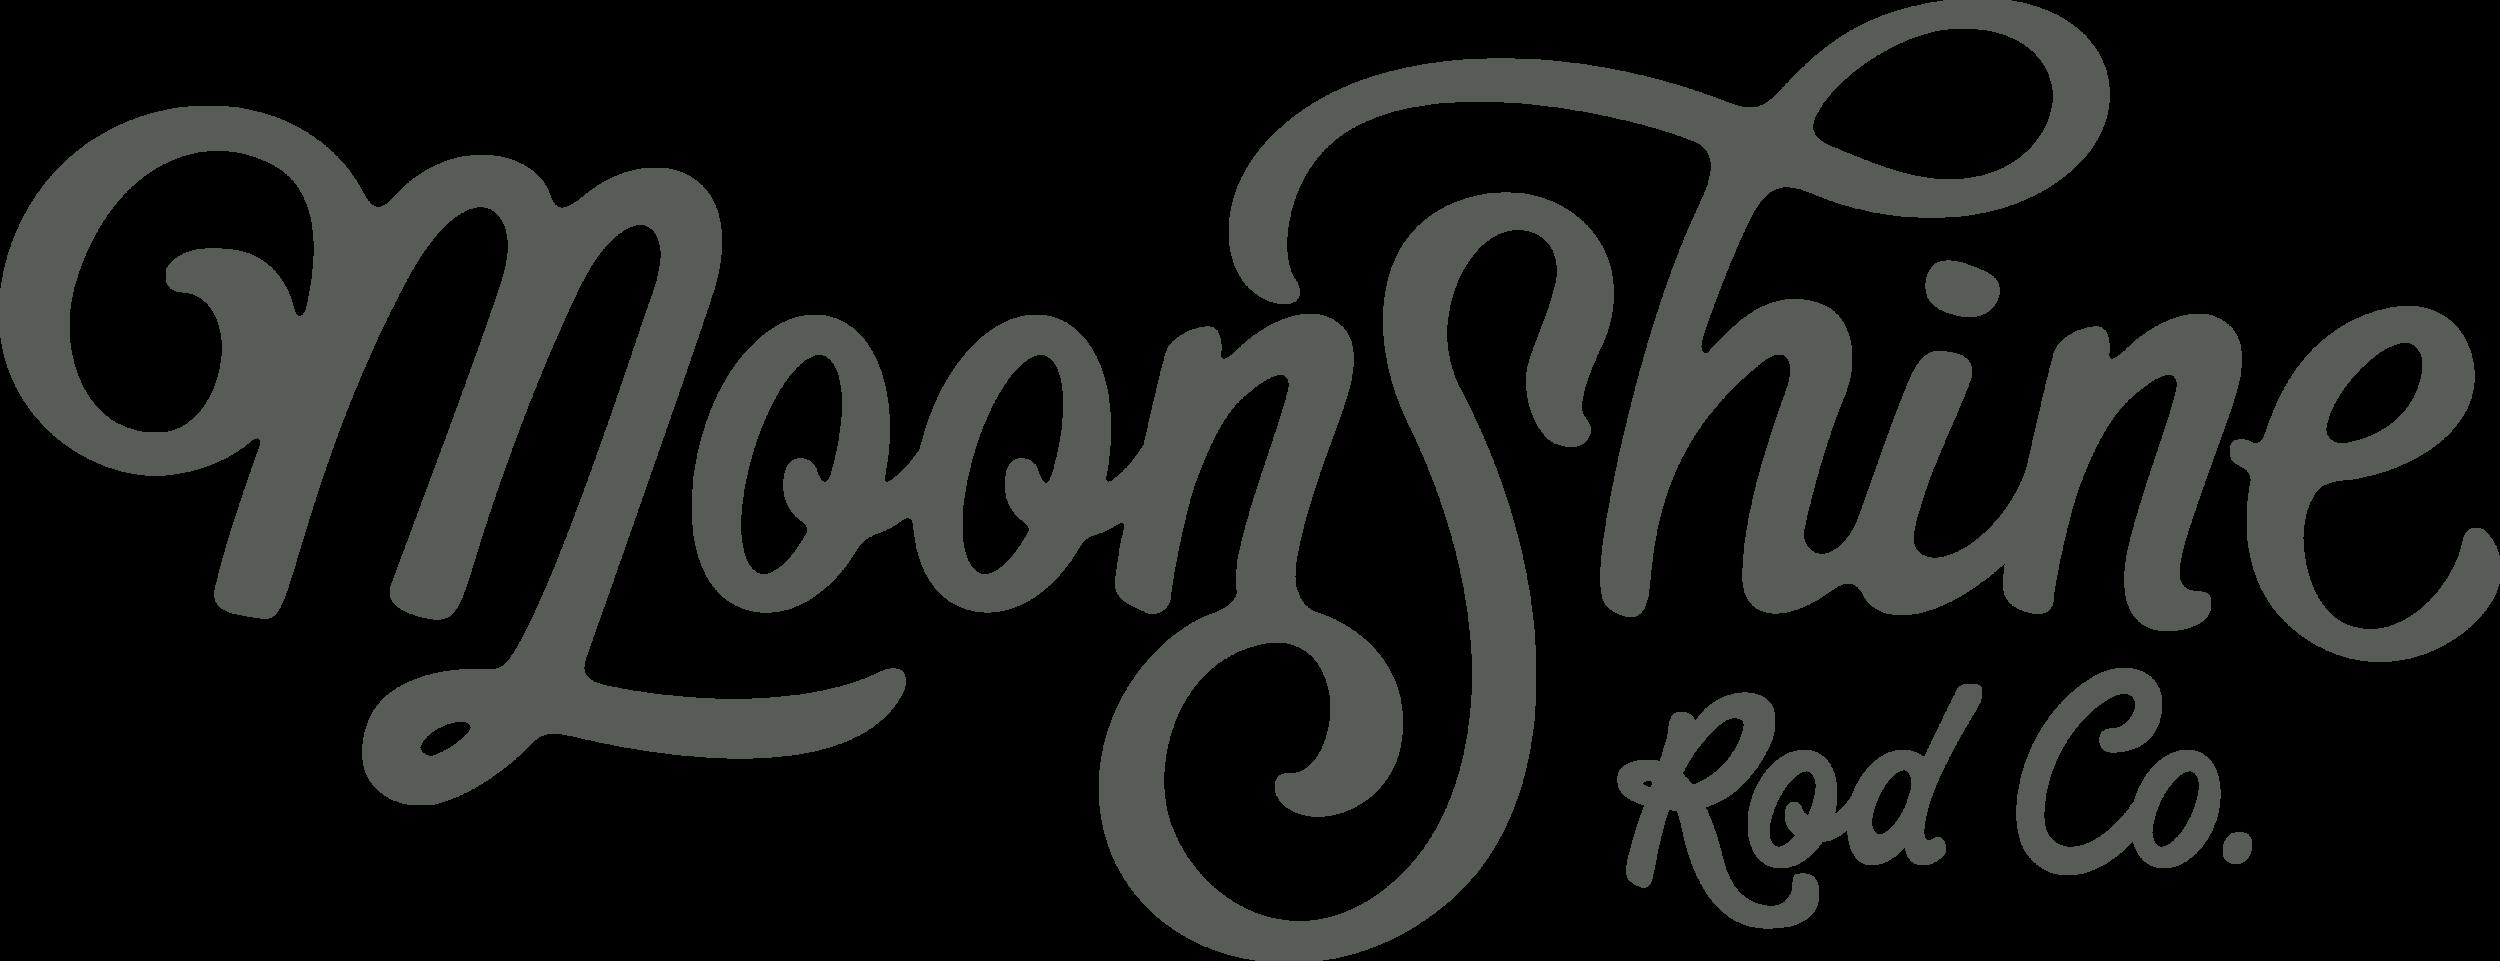 Moonshine Rod Co.   https://www.moonshinerods.com  info@moonshinerods.com